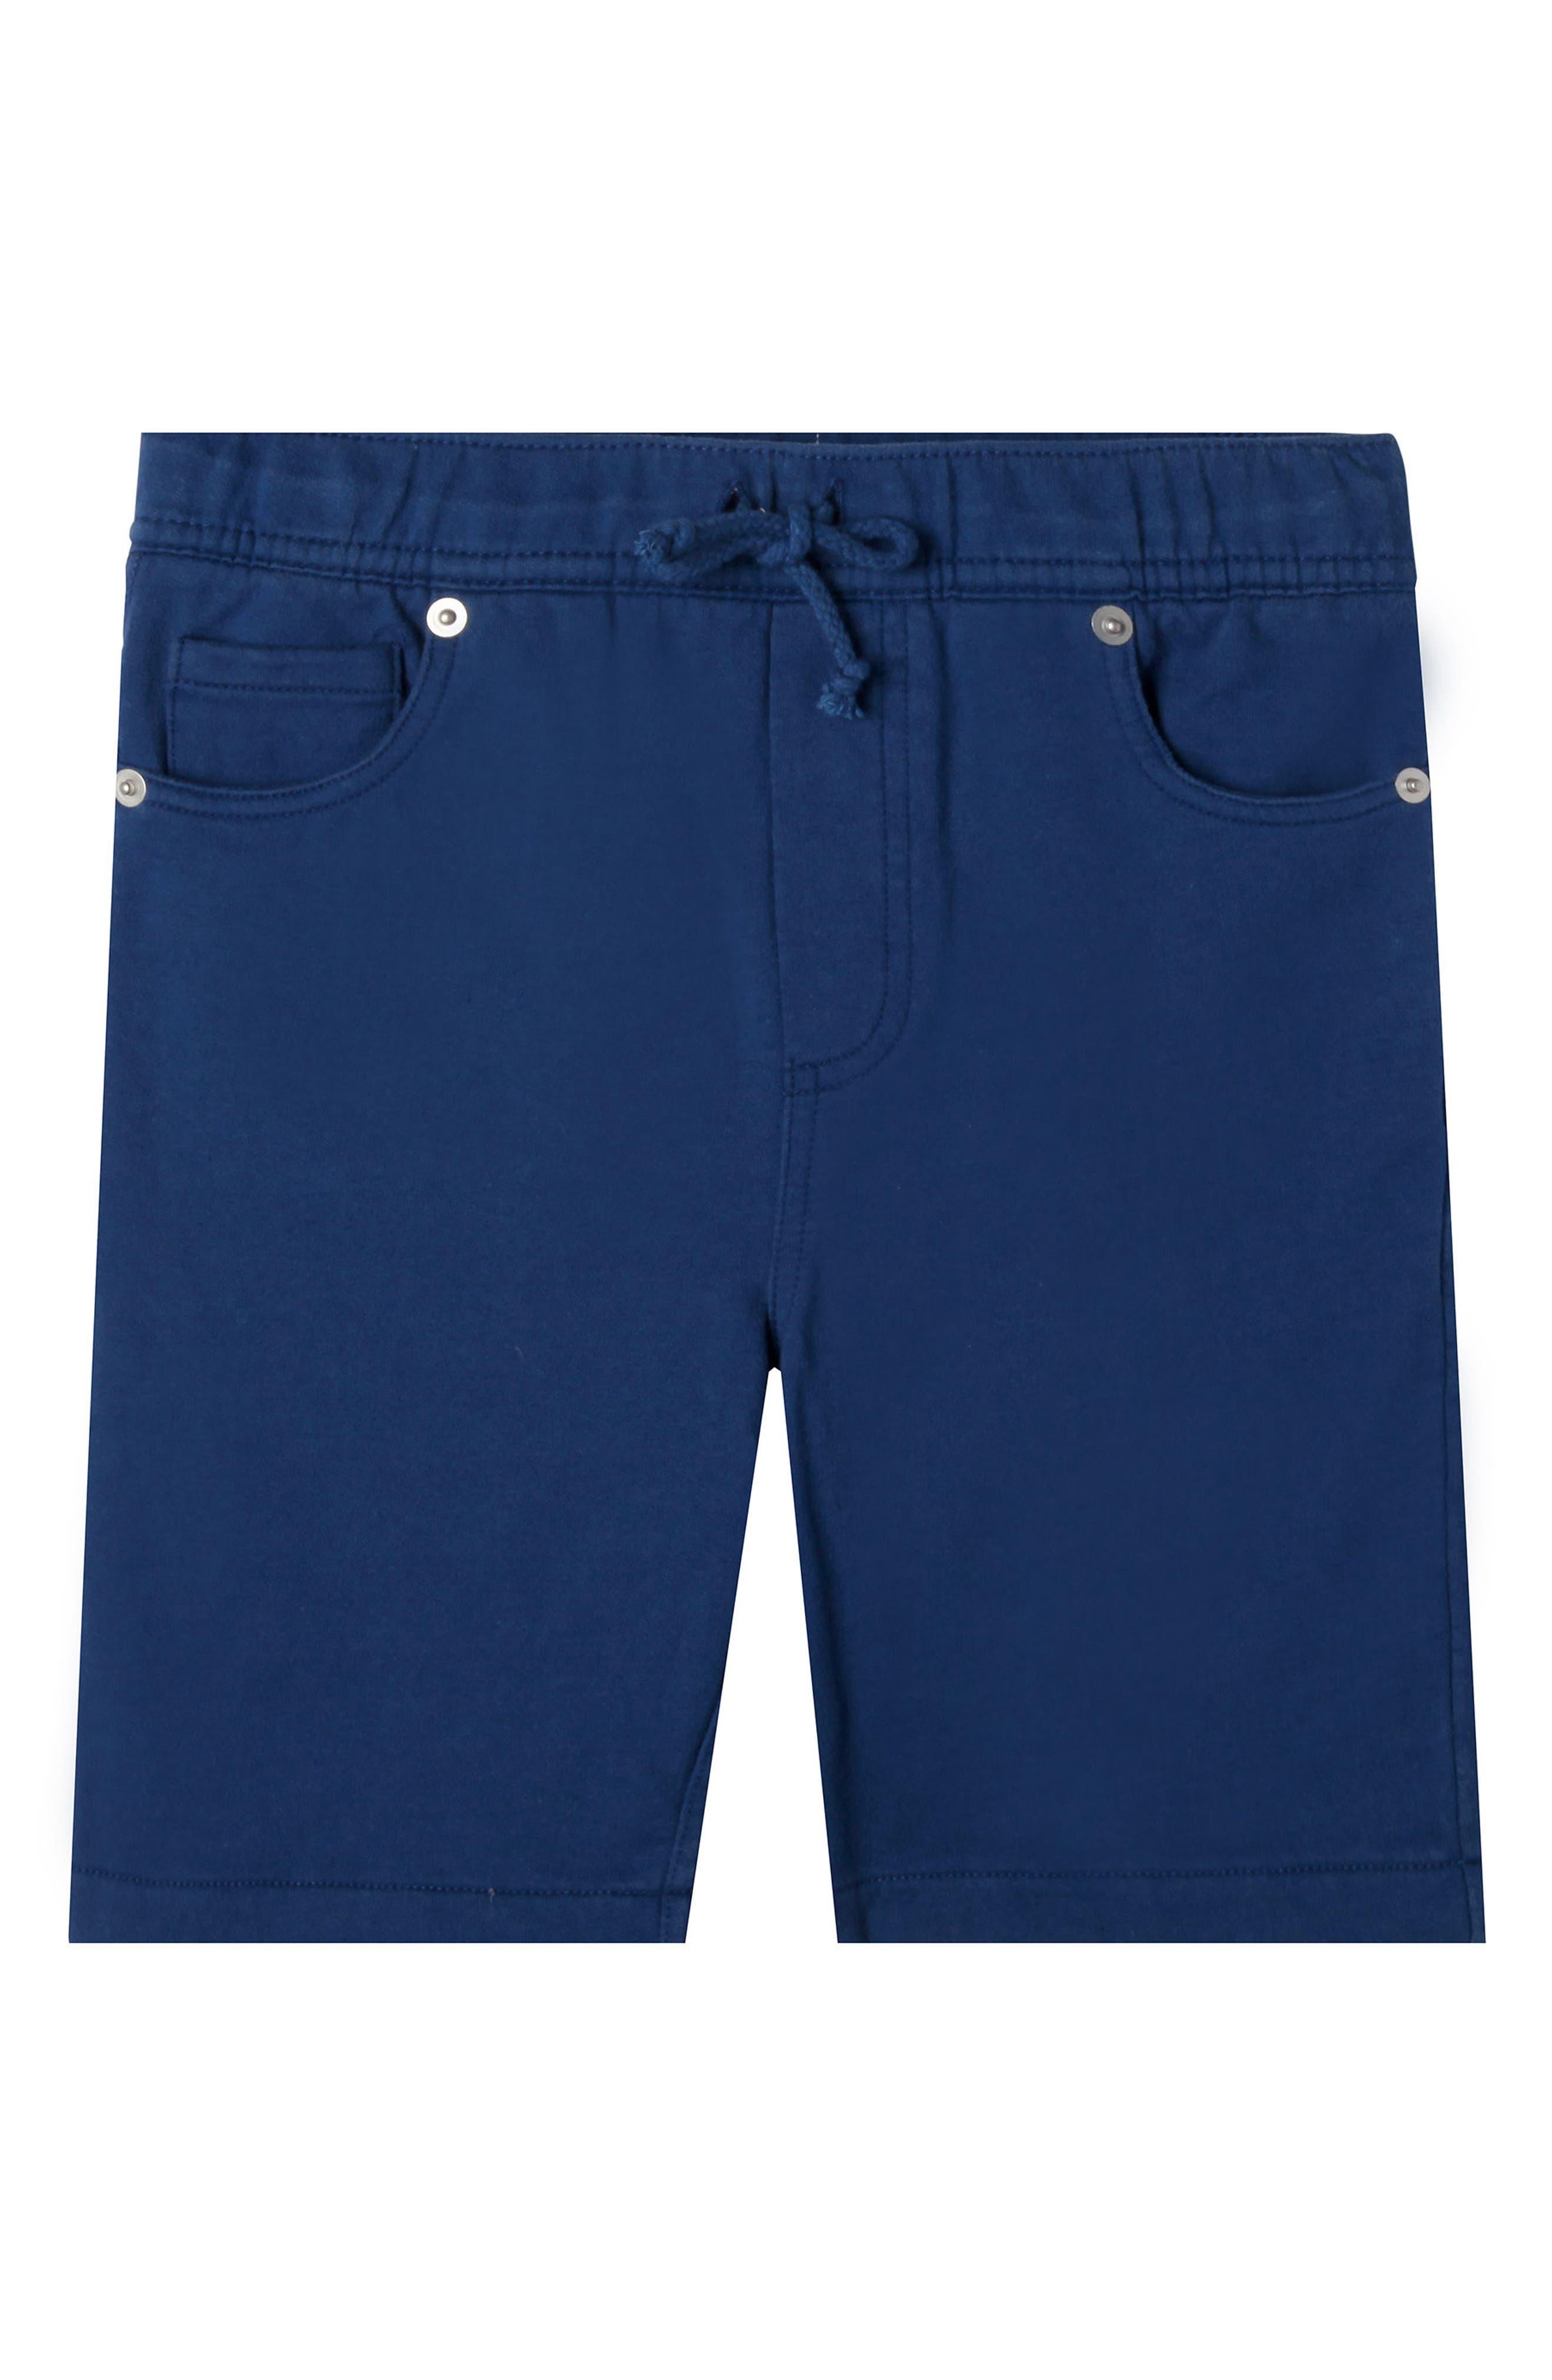 Anthony Drawstring Jeans Short,                             Main thumbnail 1, color,                             Ocean Blue